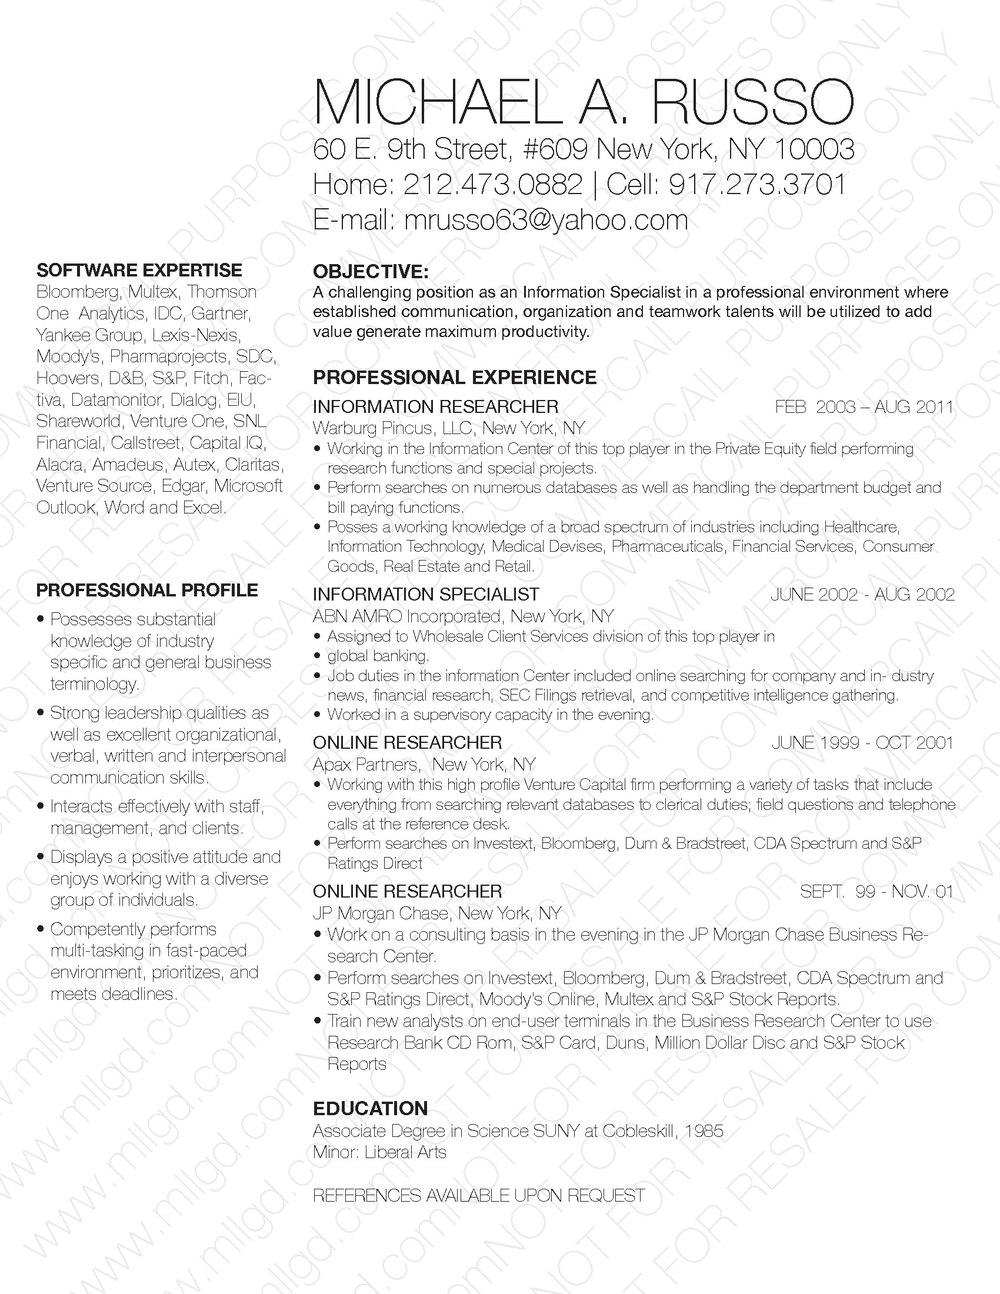 MLL_Resume_Design_2014_Page_11.jpg